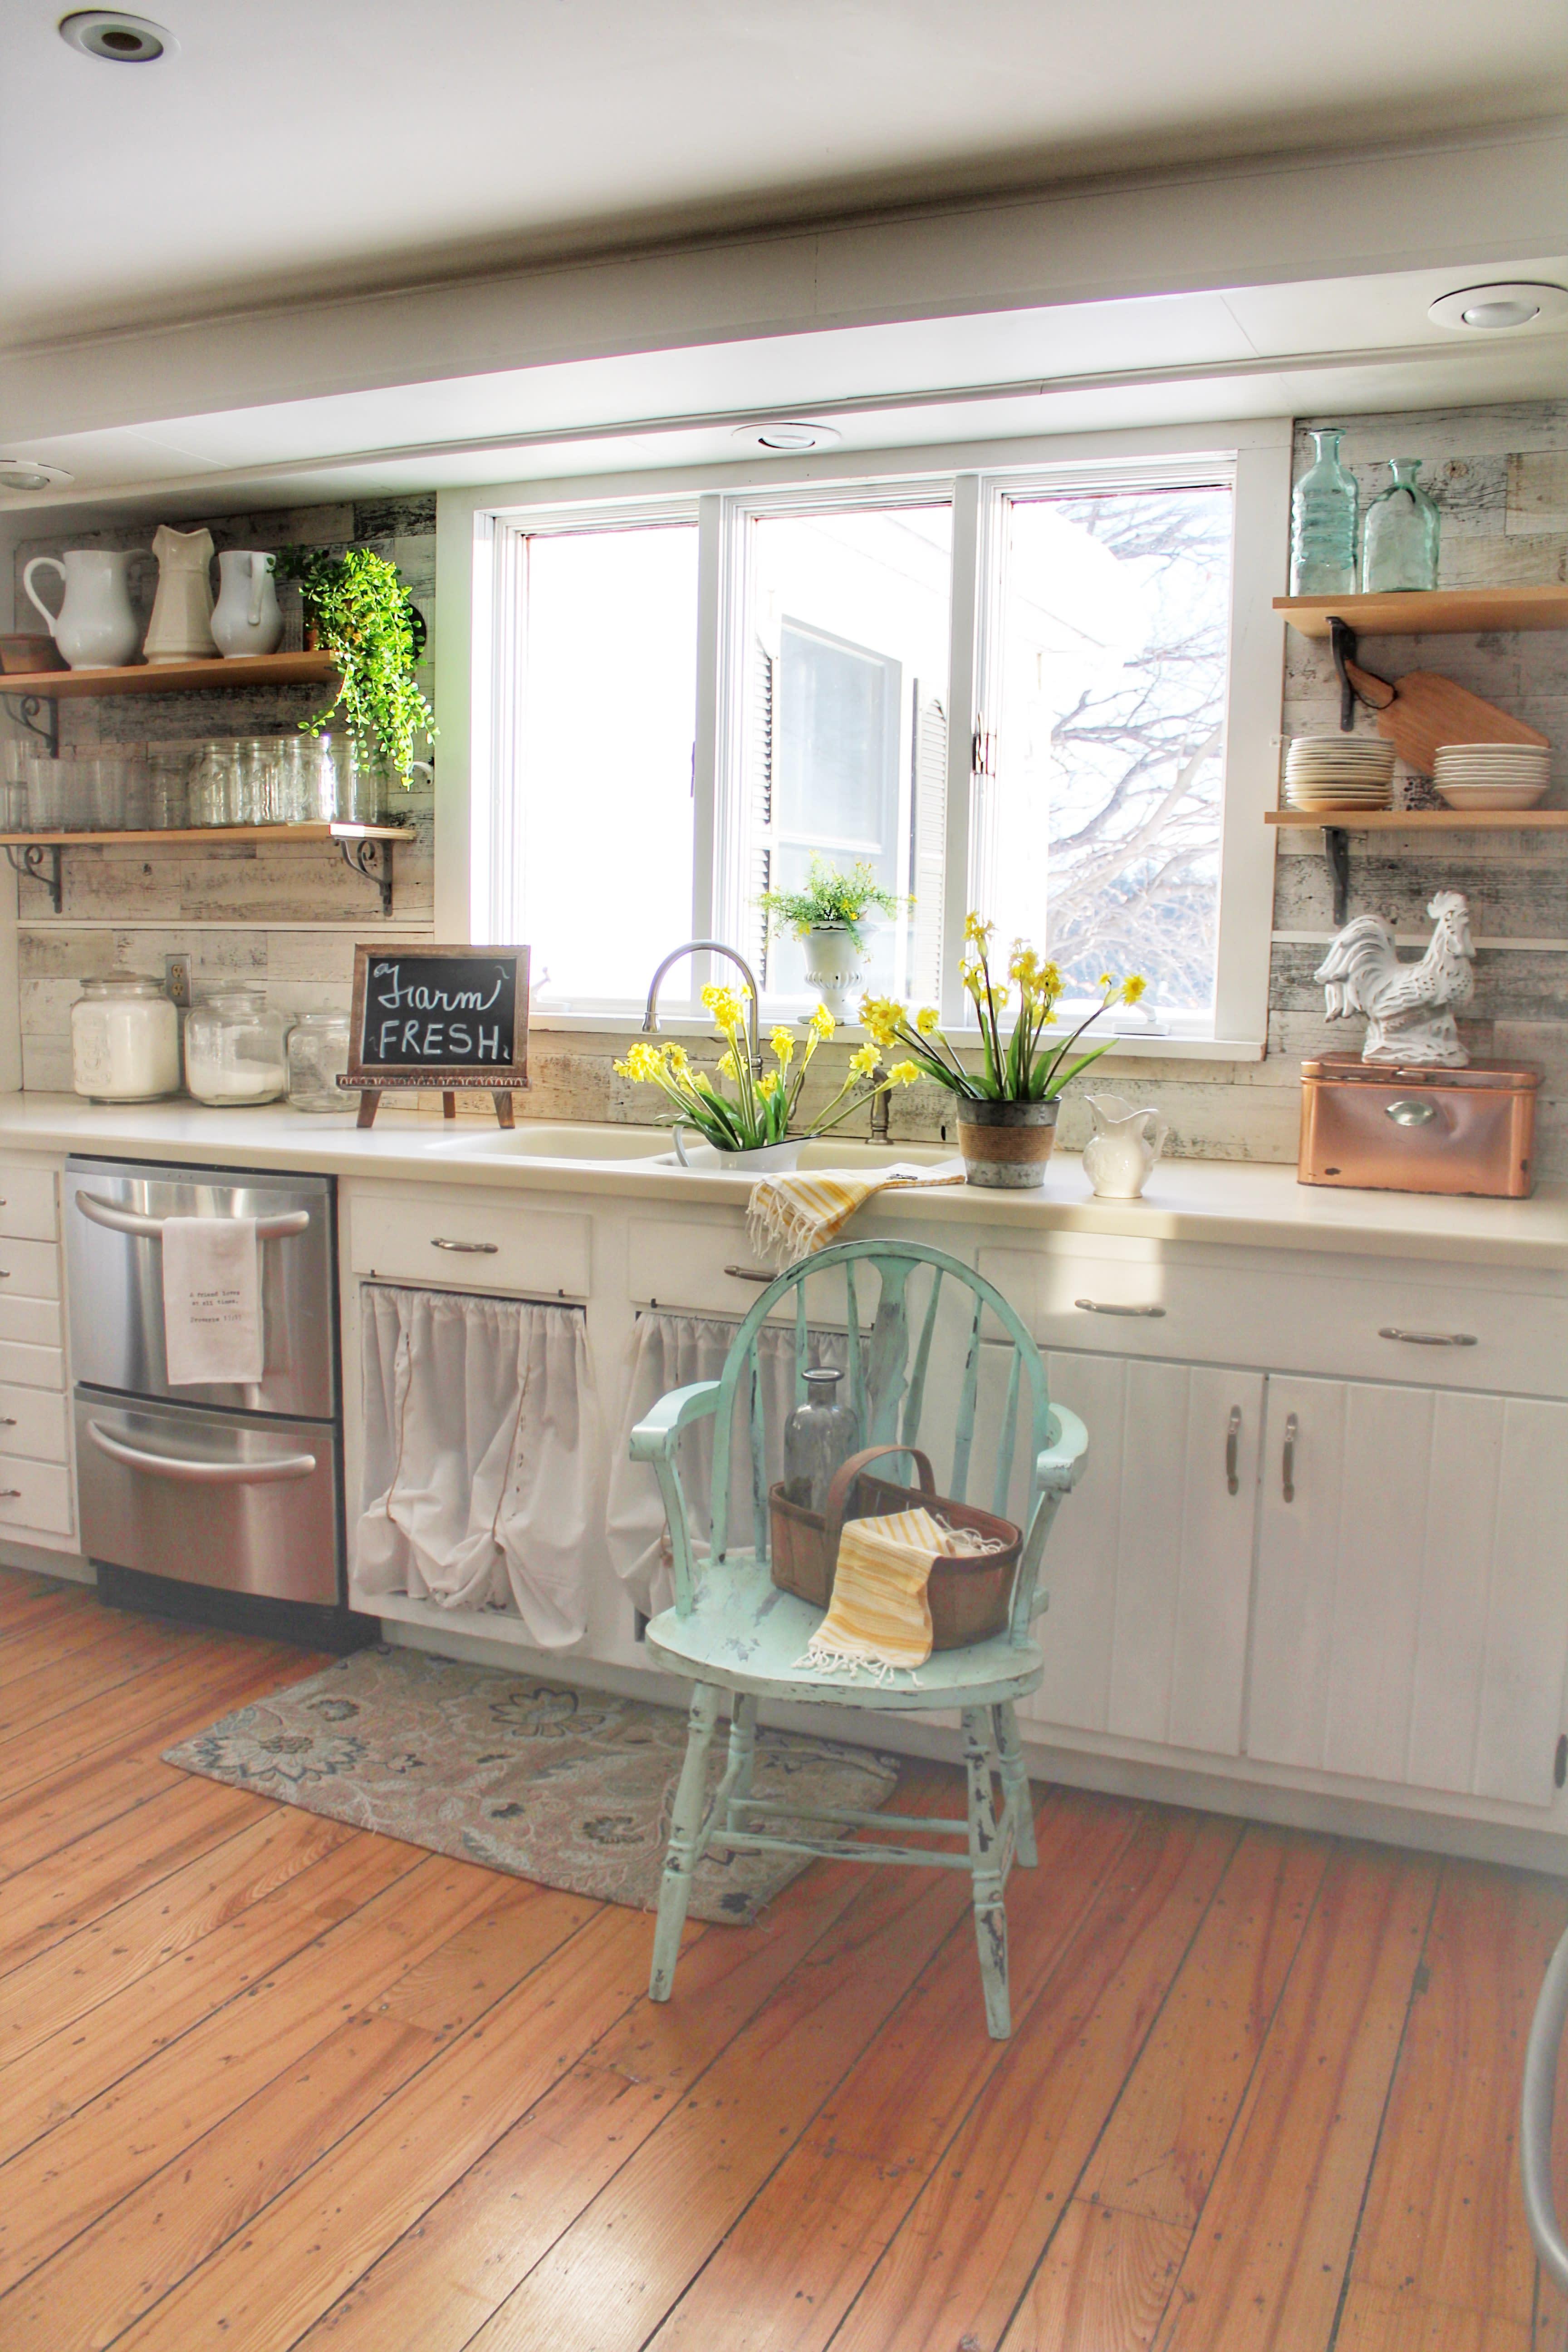 Kitchen sink with reclaimed barnwood backsplash created with Stikwood peel and stick wood planks.